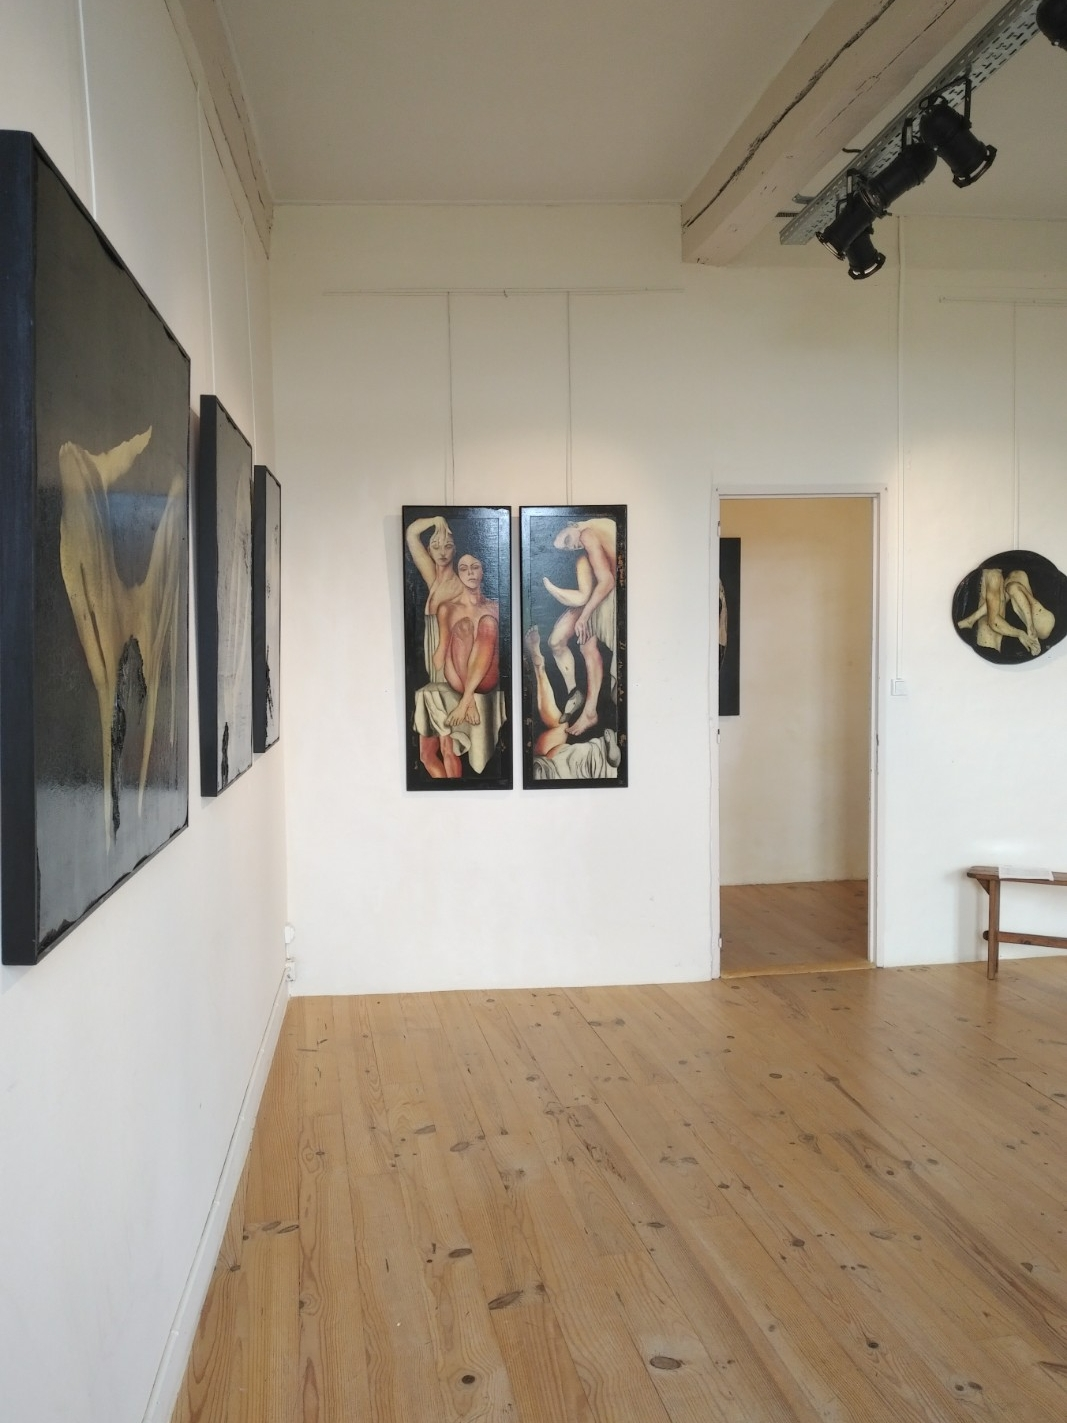 Exposition de juin 2018 Oeuvres d'Hazel Thaïs